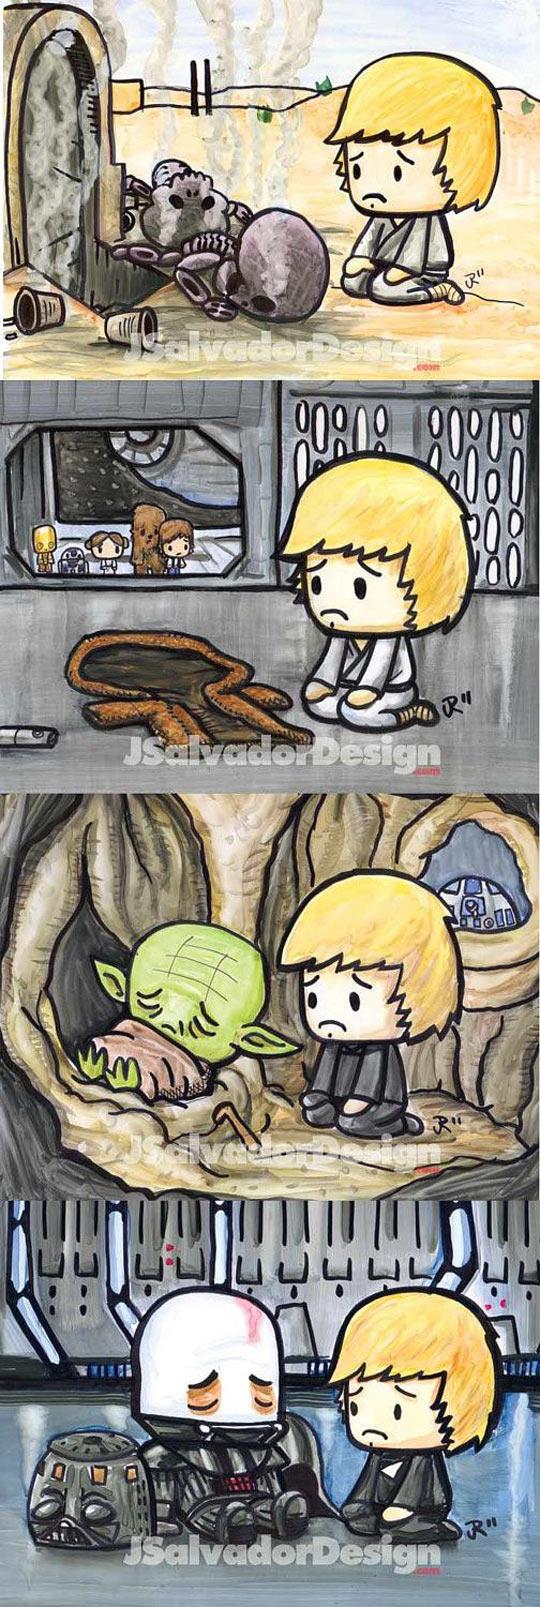 Poor Luke Skywalker